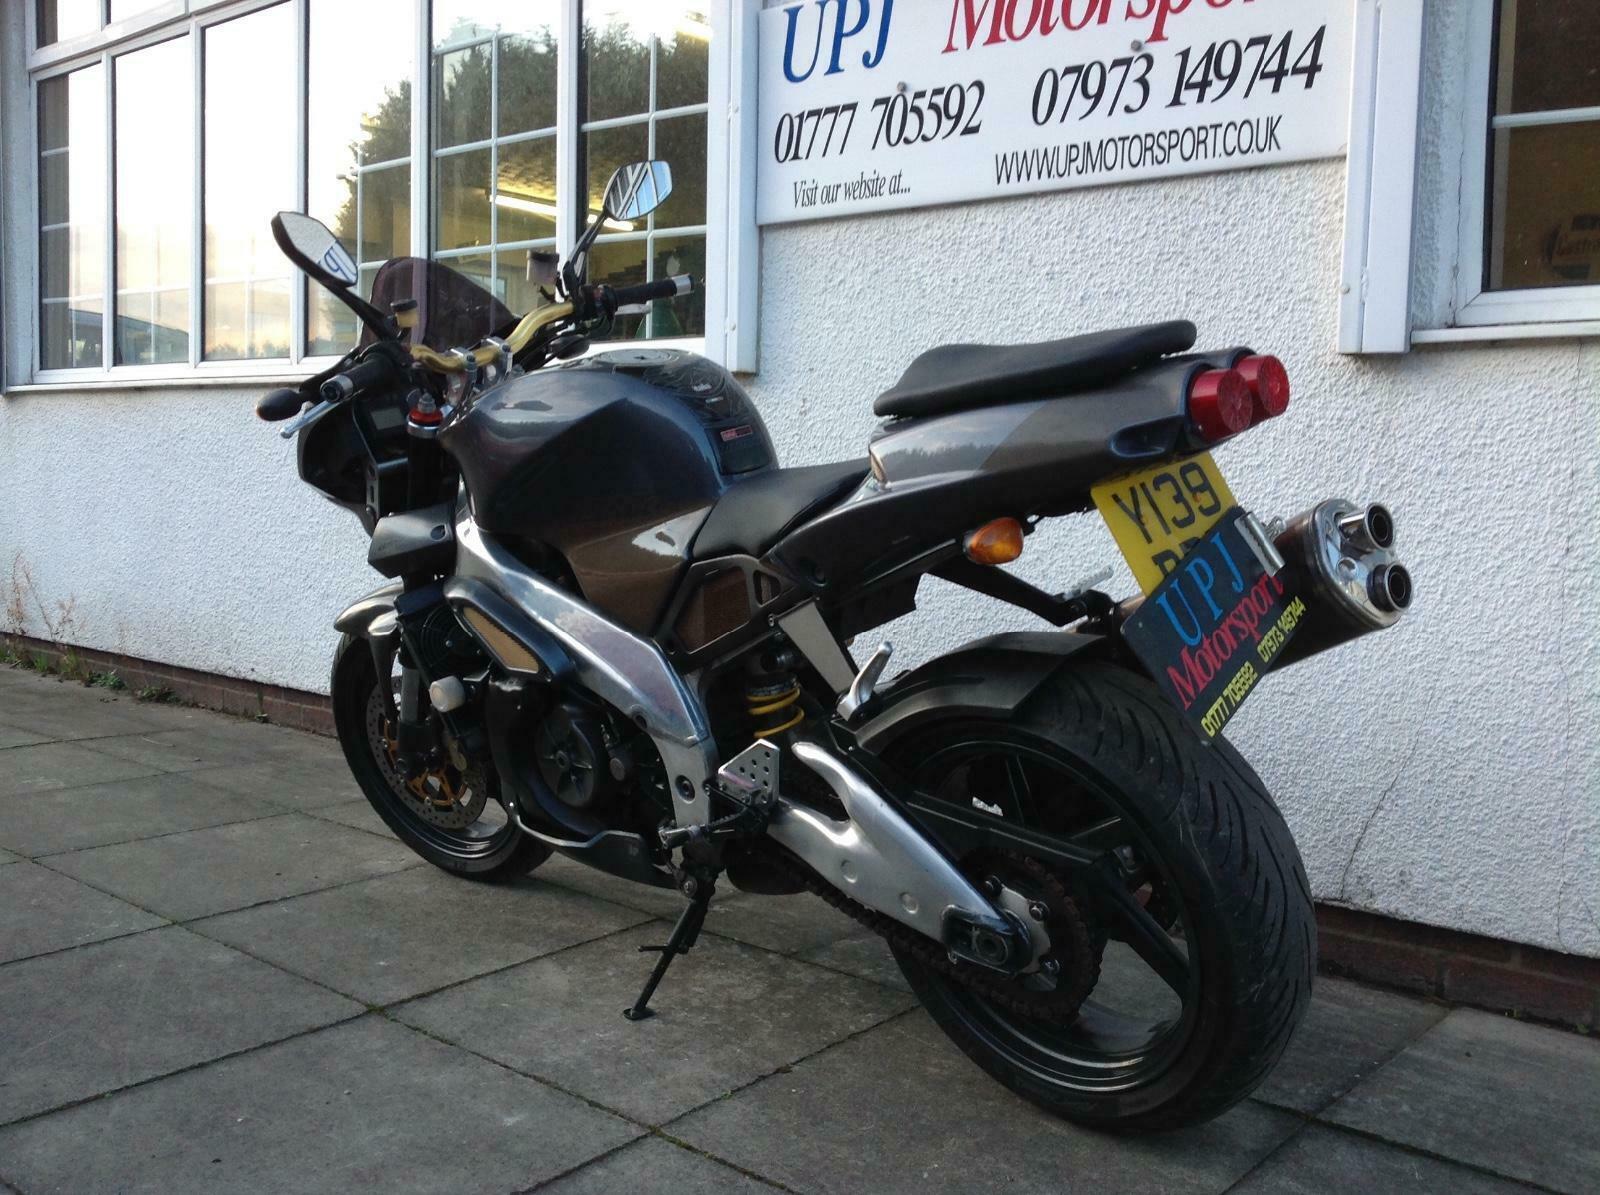 Aprilia Tuono 1000 cc 2001 Y reg, naked, muscle bike - UPJ